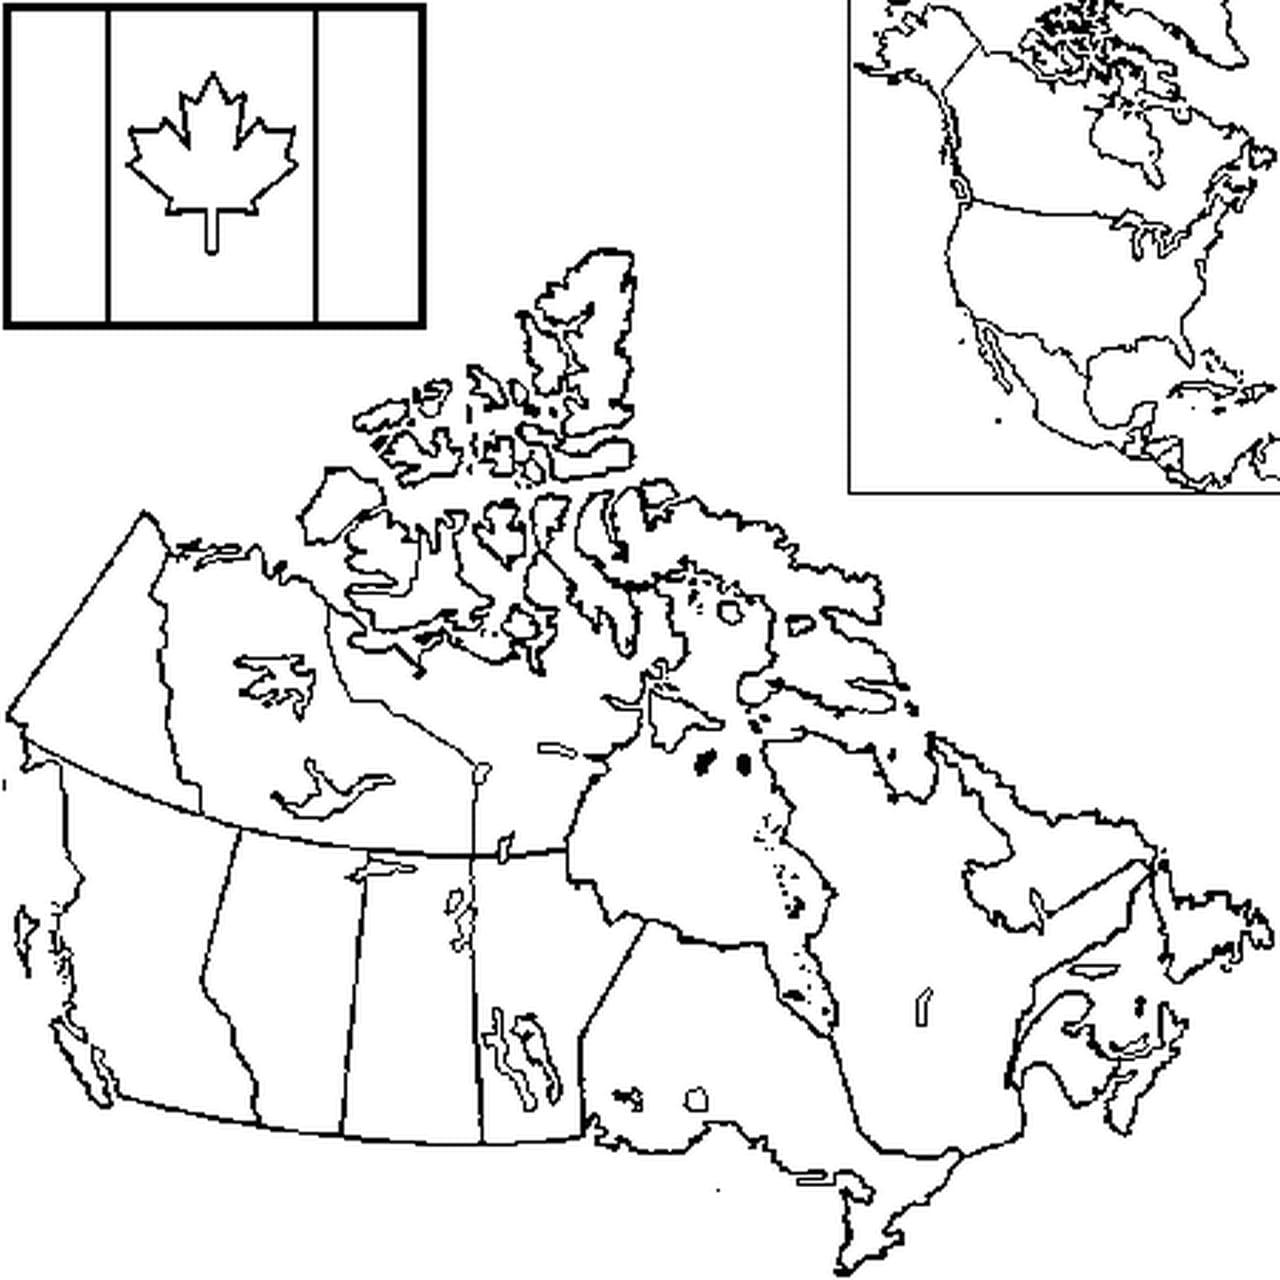 Carte Canada Vierge Imprimer.Coloriage Carte Canada En Ligne Gratuit A Imprimer